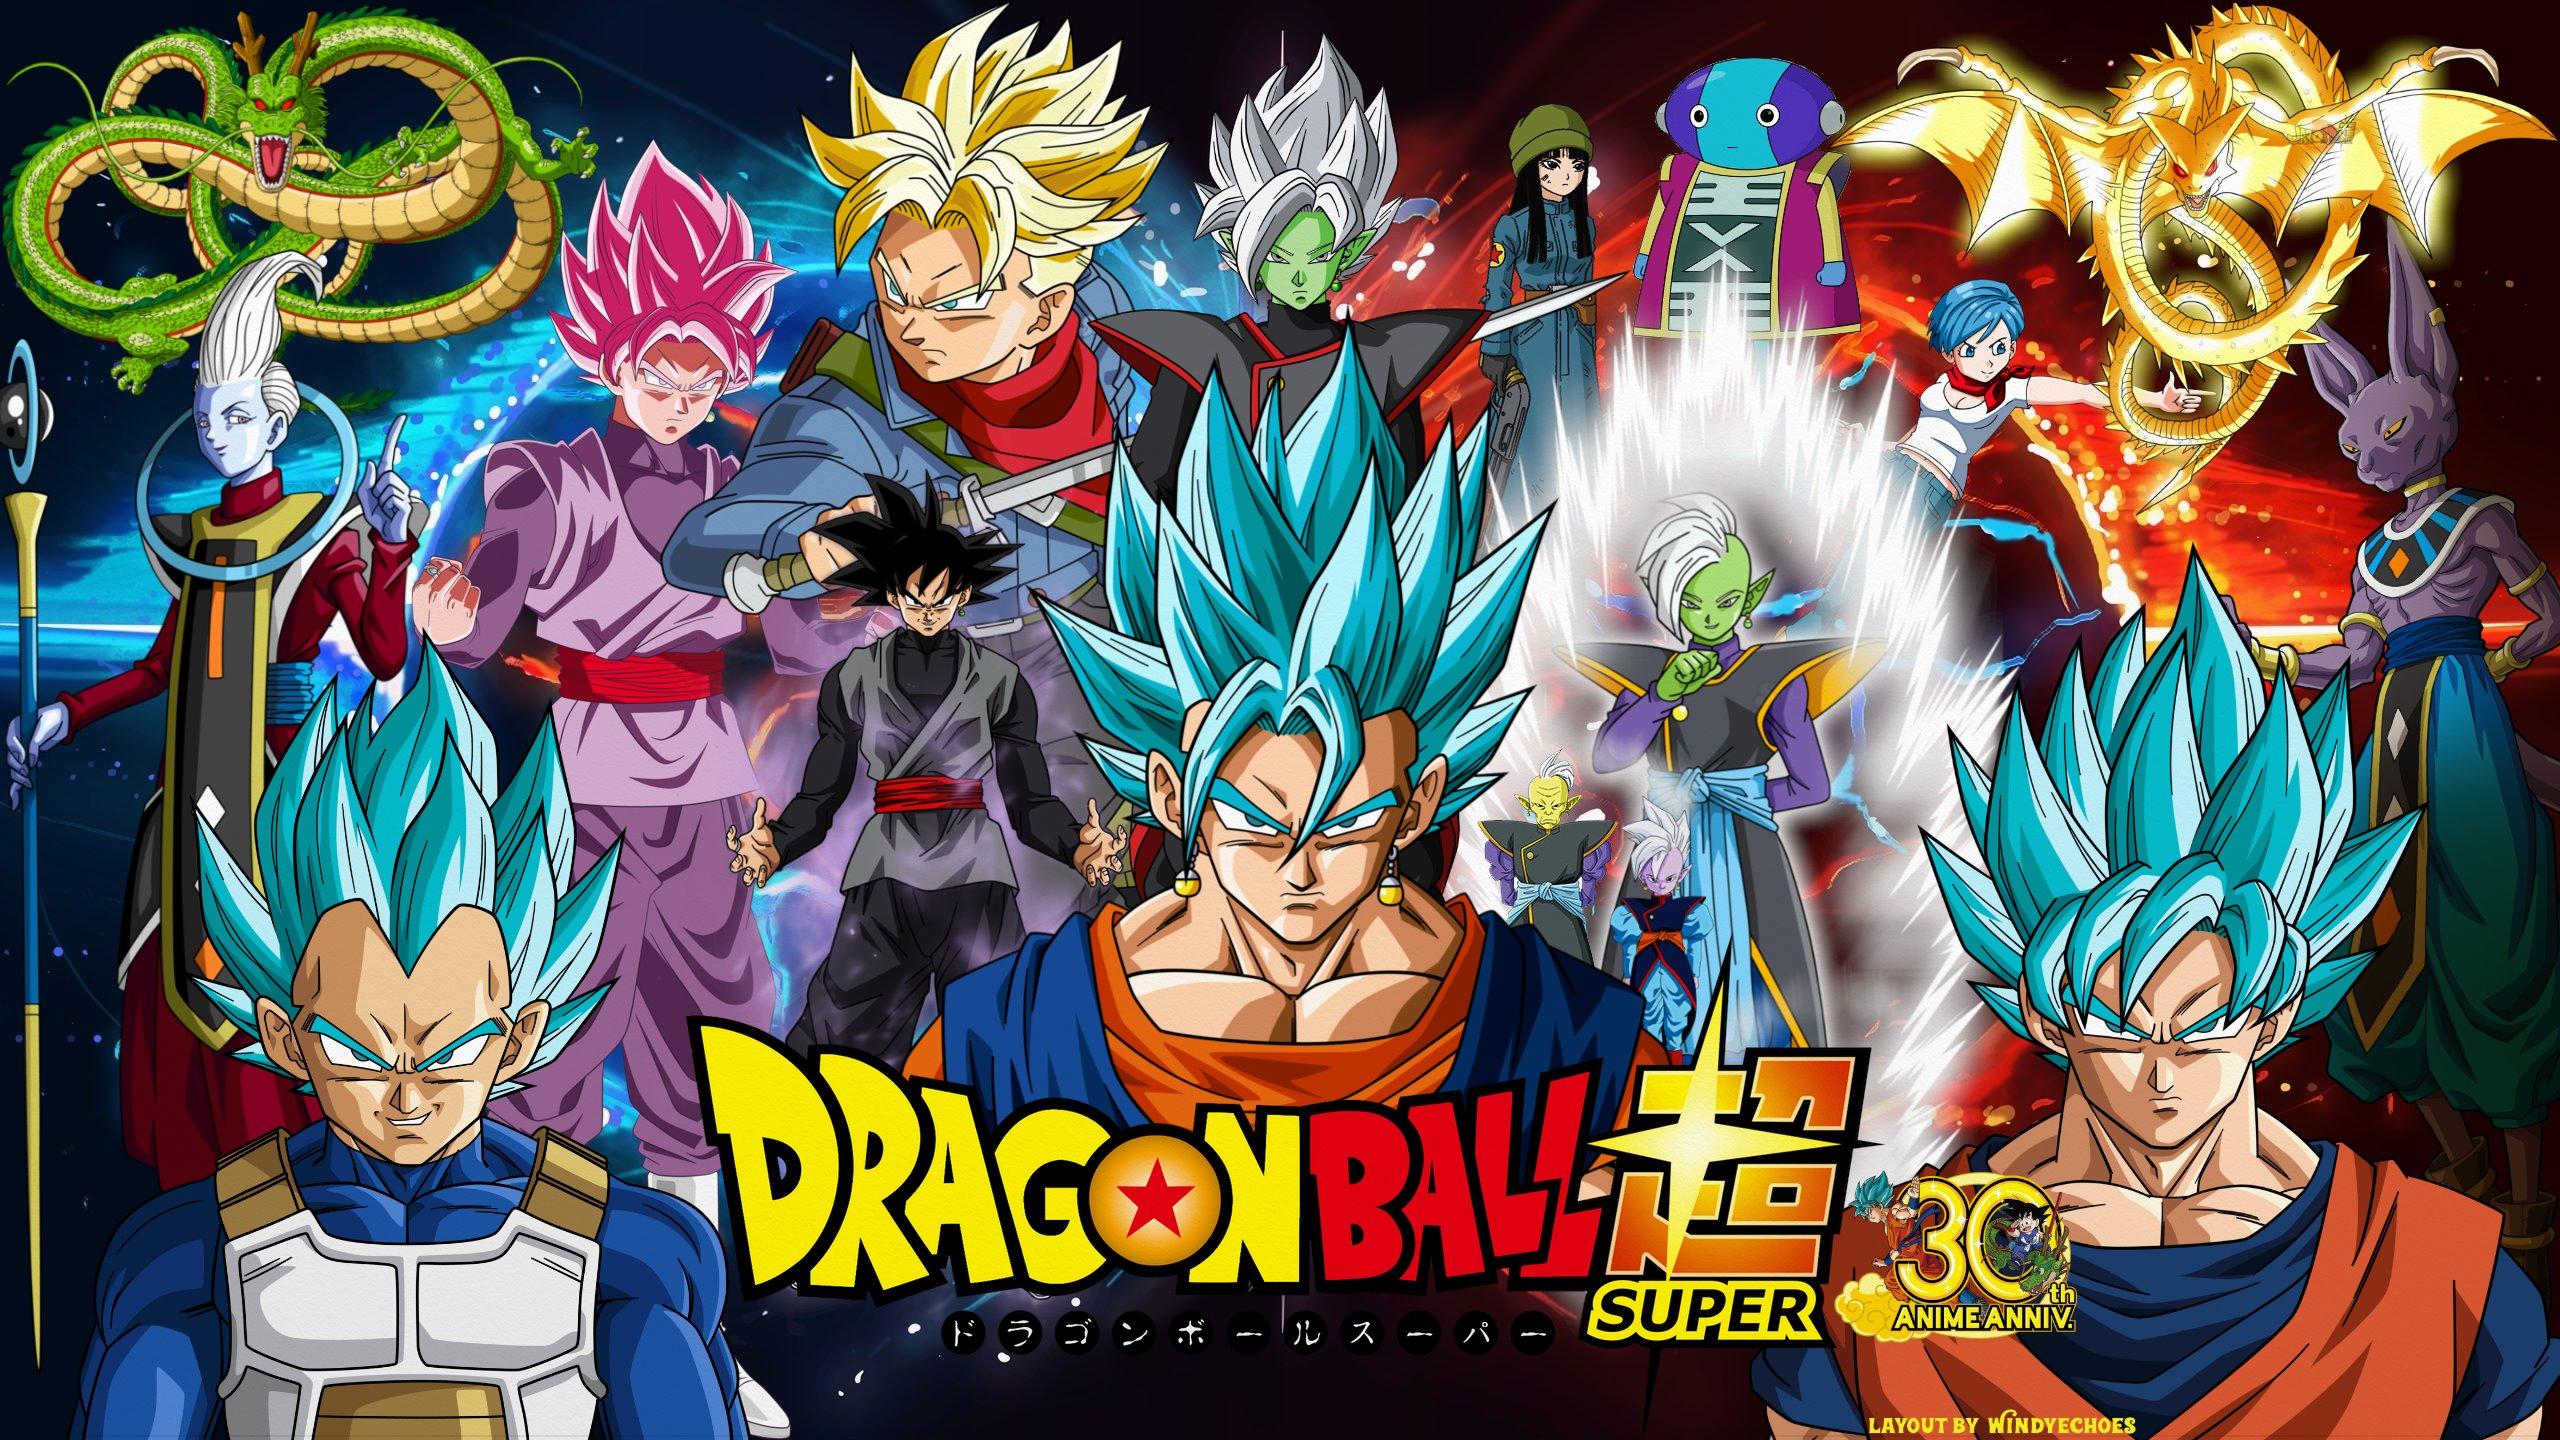 Dragon Ball Super Wallpaper Vegito Vs Zamasu By Windyechoes On